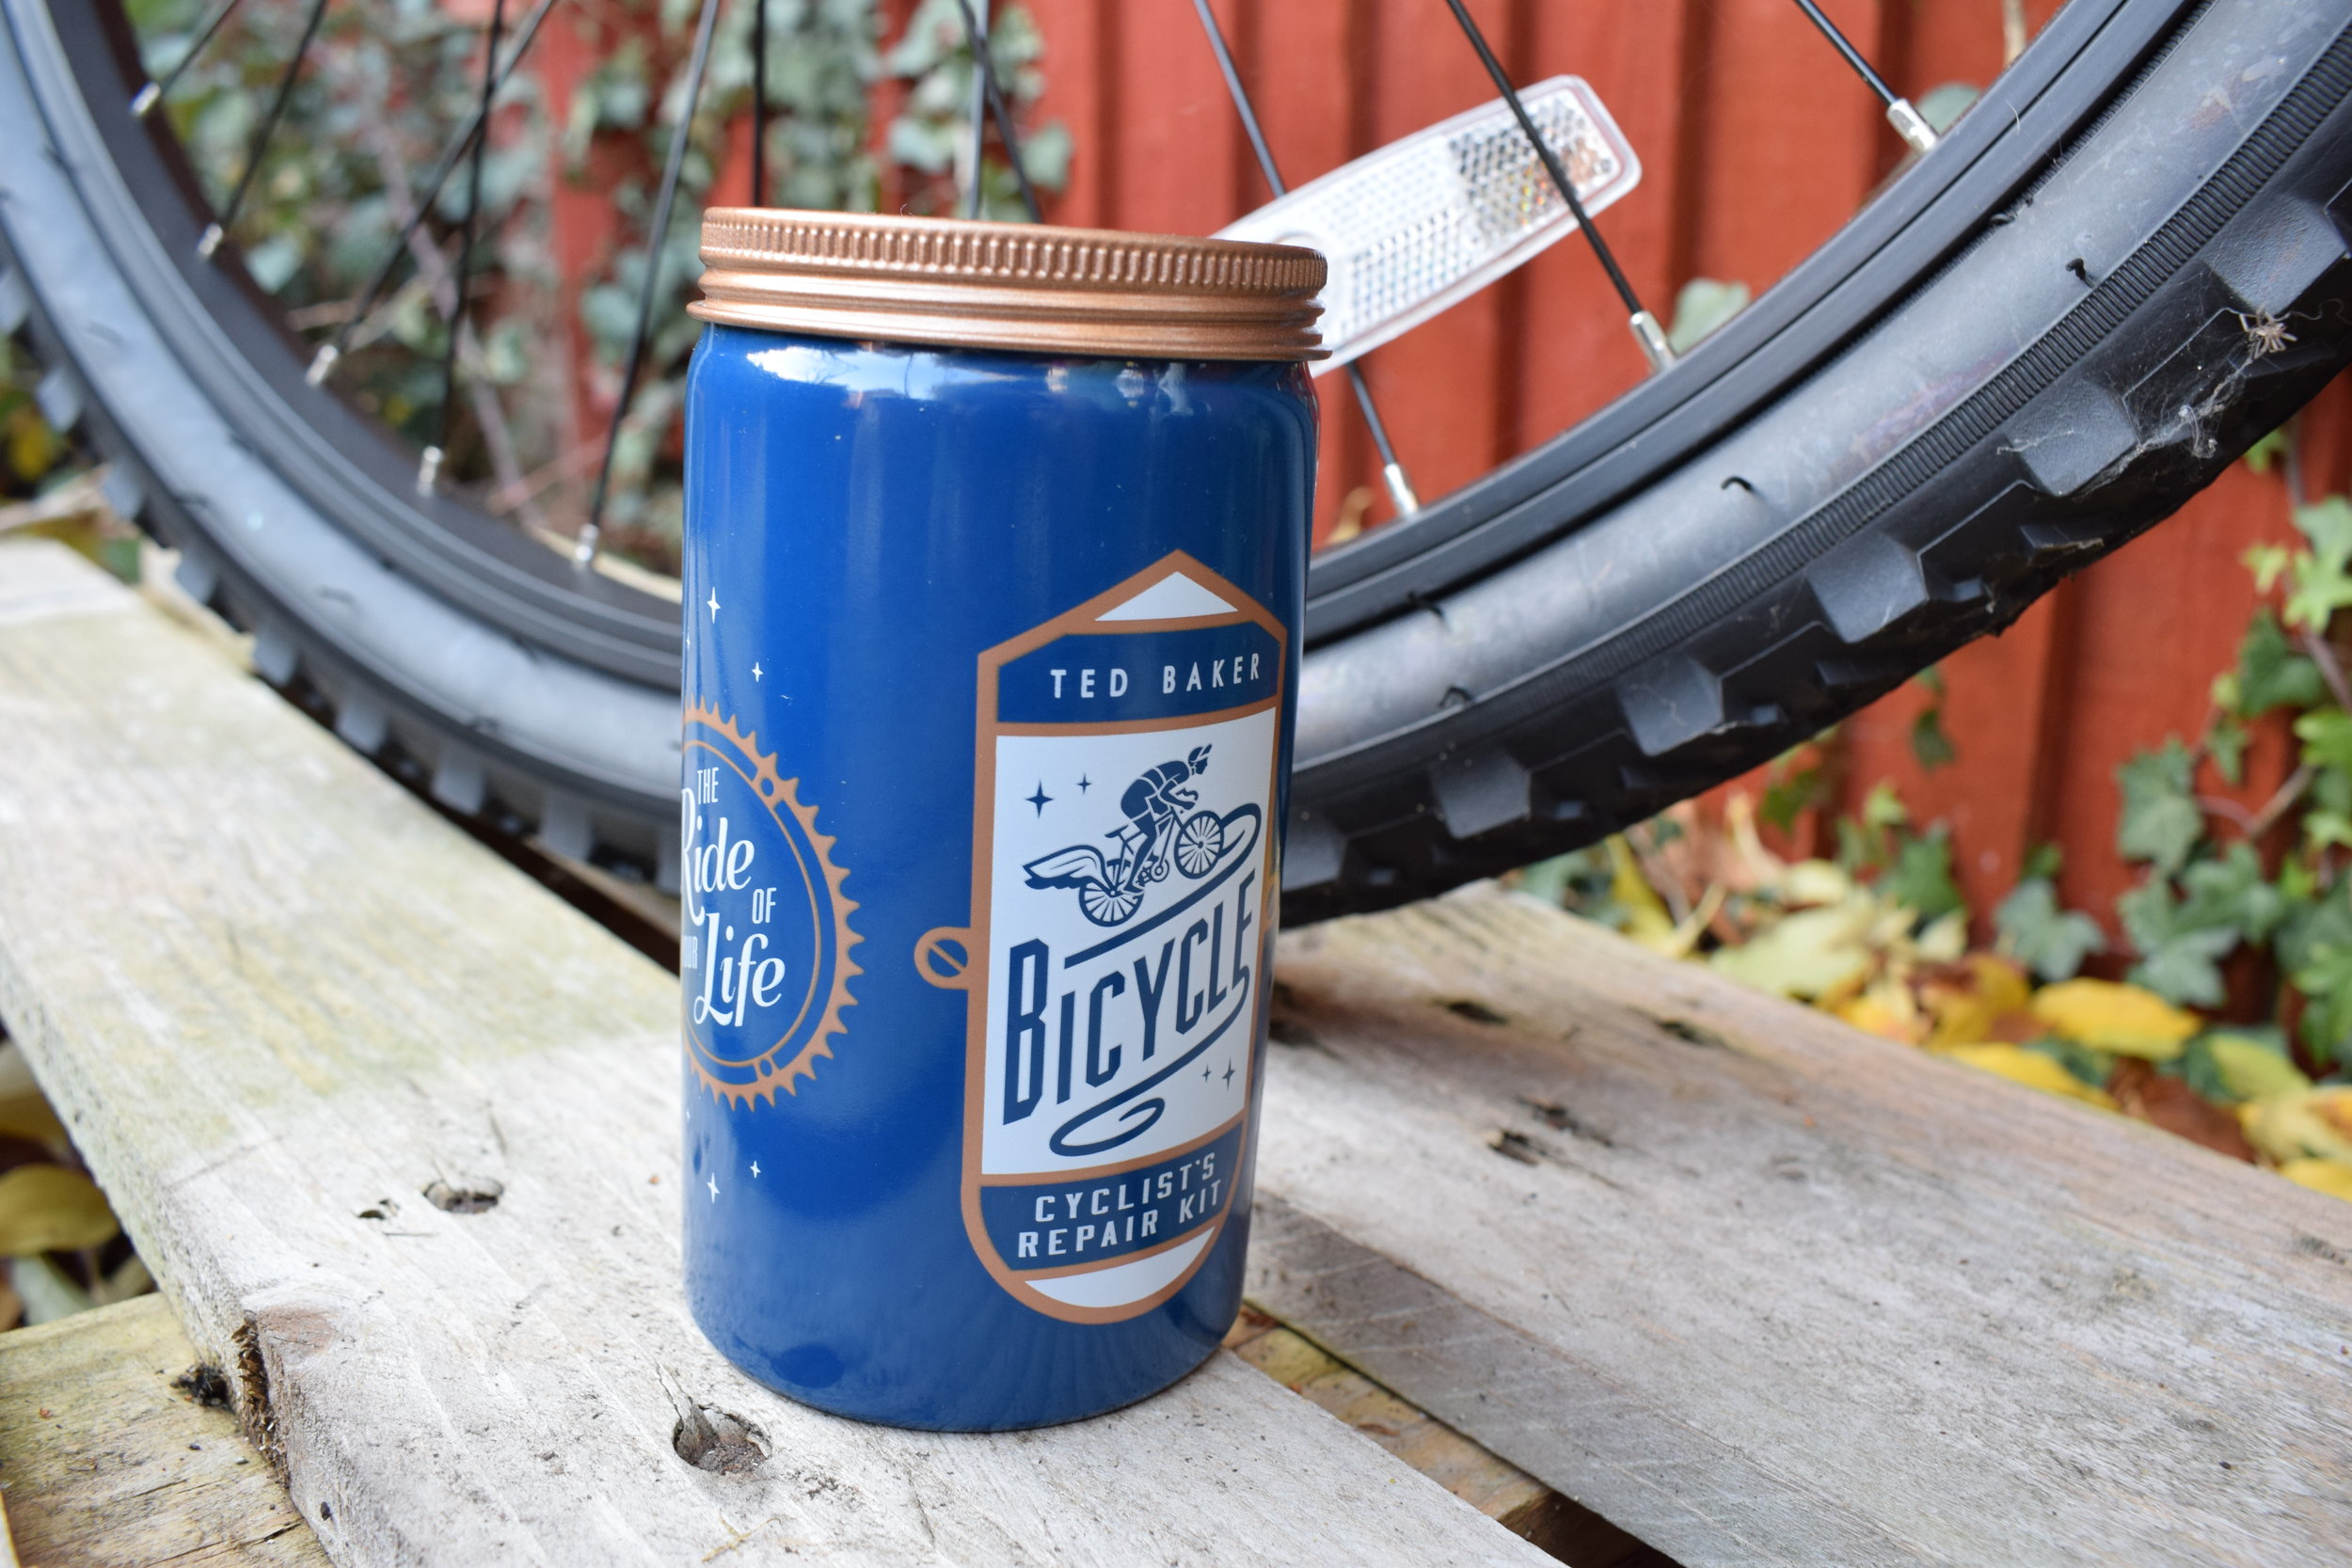 Amara Ted Baker bicycle bike cyclist's repair kit